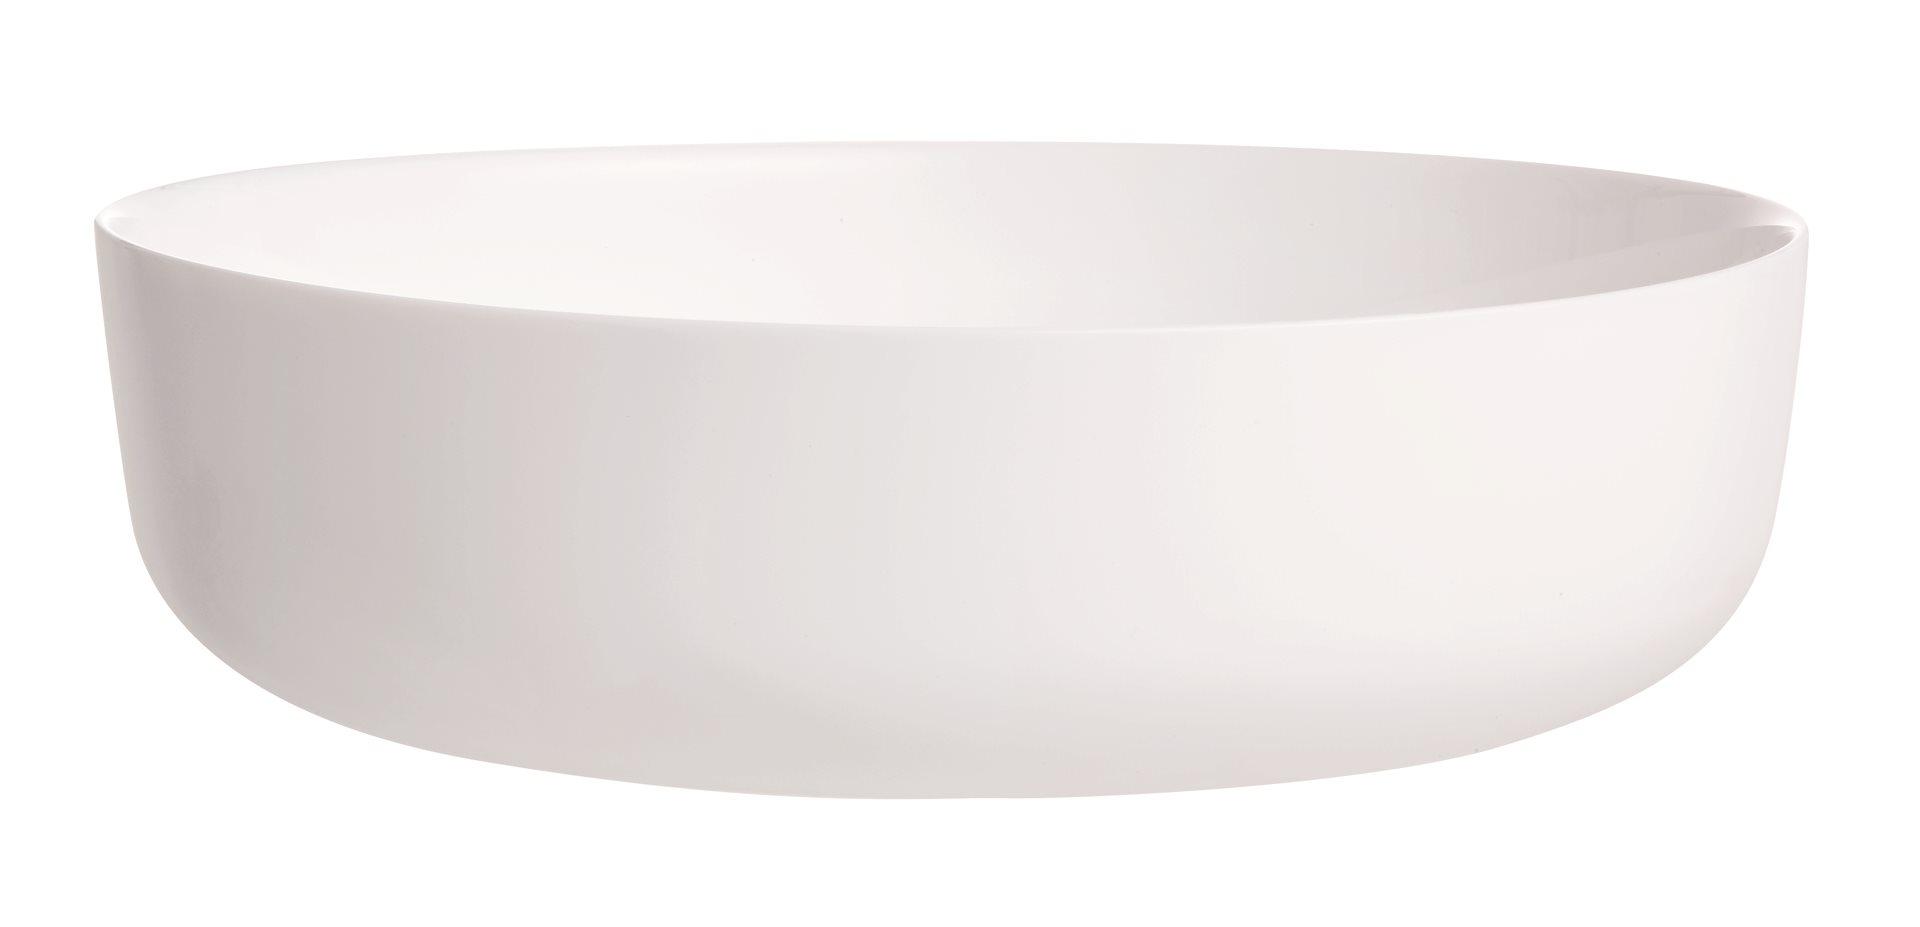 LUMINARC Πυρίμαχο Σκεύος Πορσελάνης 26εκ., 2Lt. Λευκό Diwali - N6416